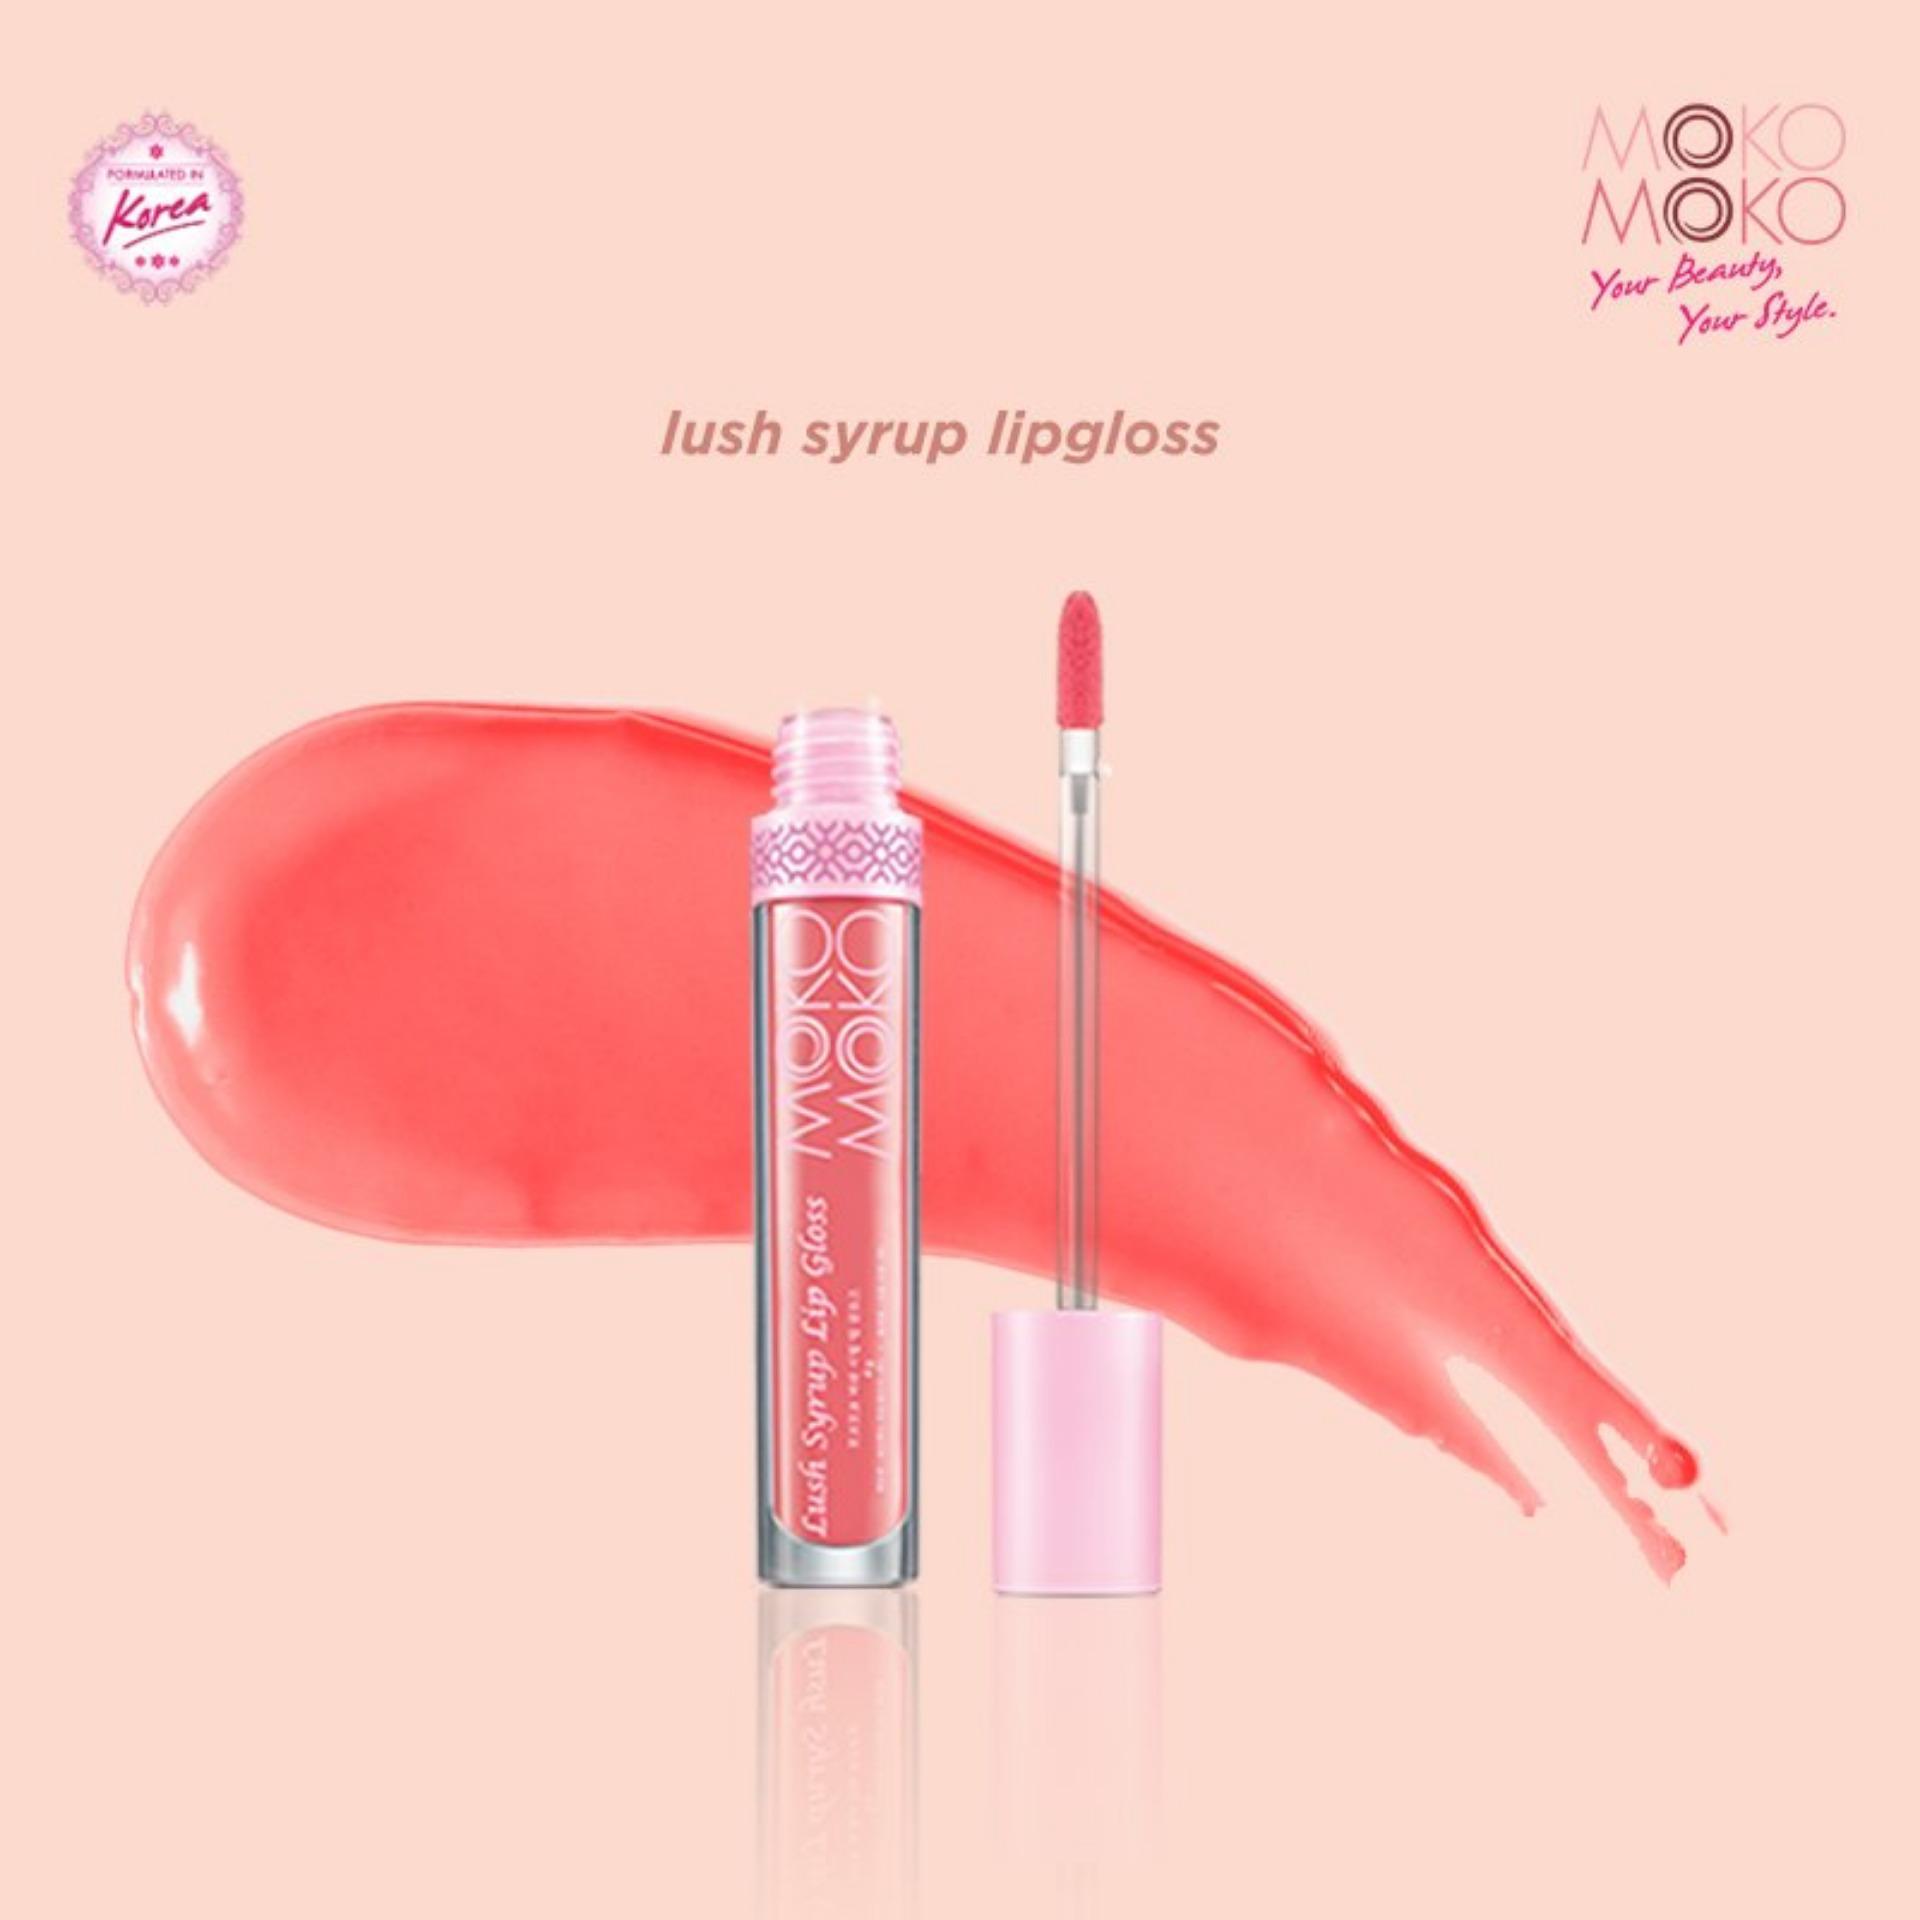 Moko Moko Lush Syrup Lip Gloss (Peach Pink) - Korean Lip Gloss